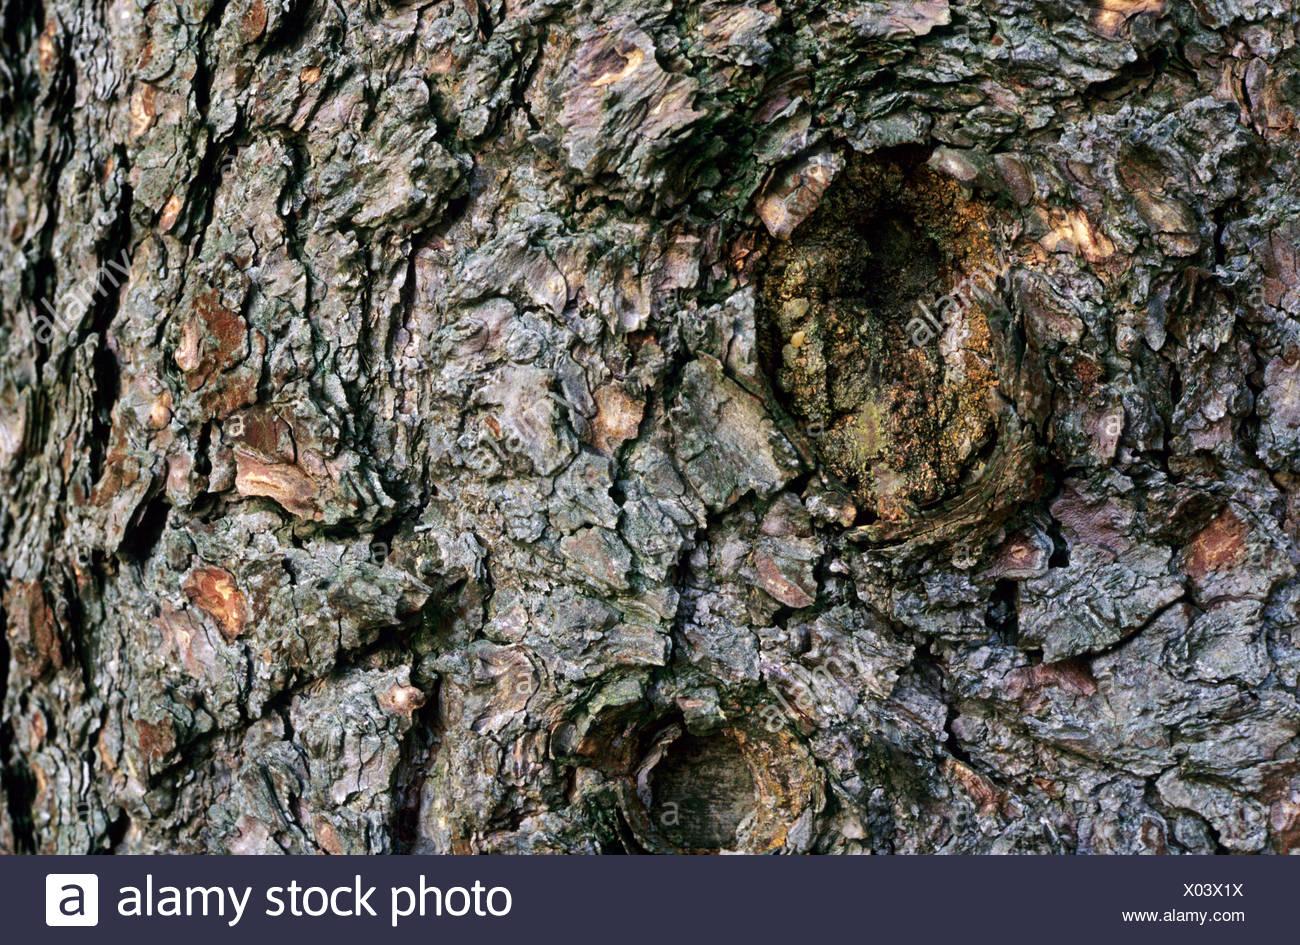 ponderosa pine, western yellow pine, blackjack pine, bull pine (Pinus ponderosa), bark - Stock Image